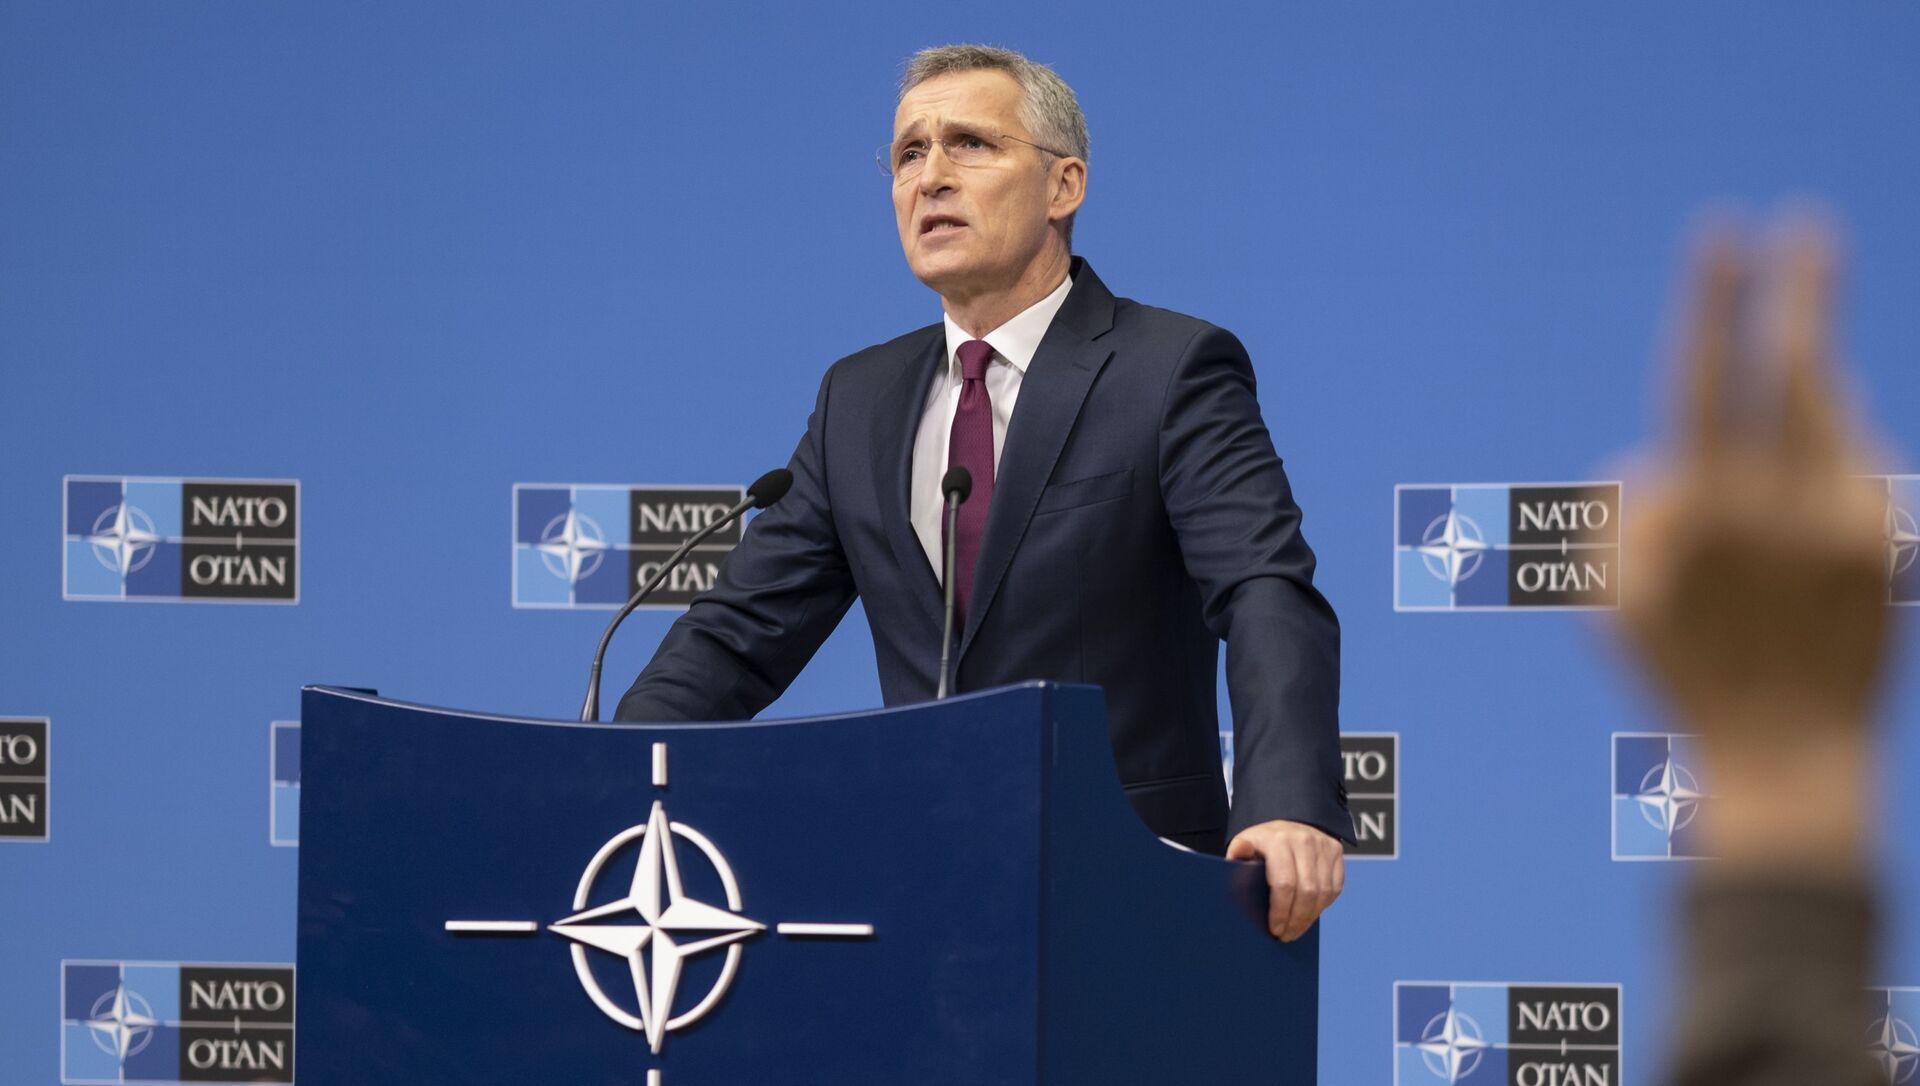 Генерални секретар НАТО Јенс Столтенберг - Sputnik Србија, 1920, 23.03.2021